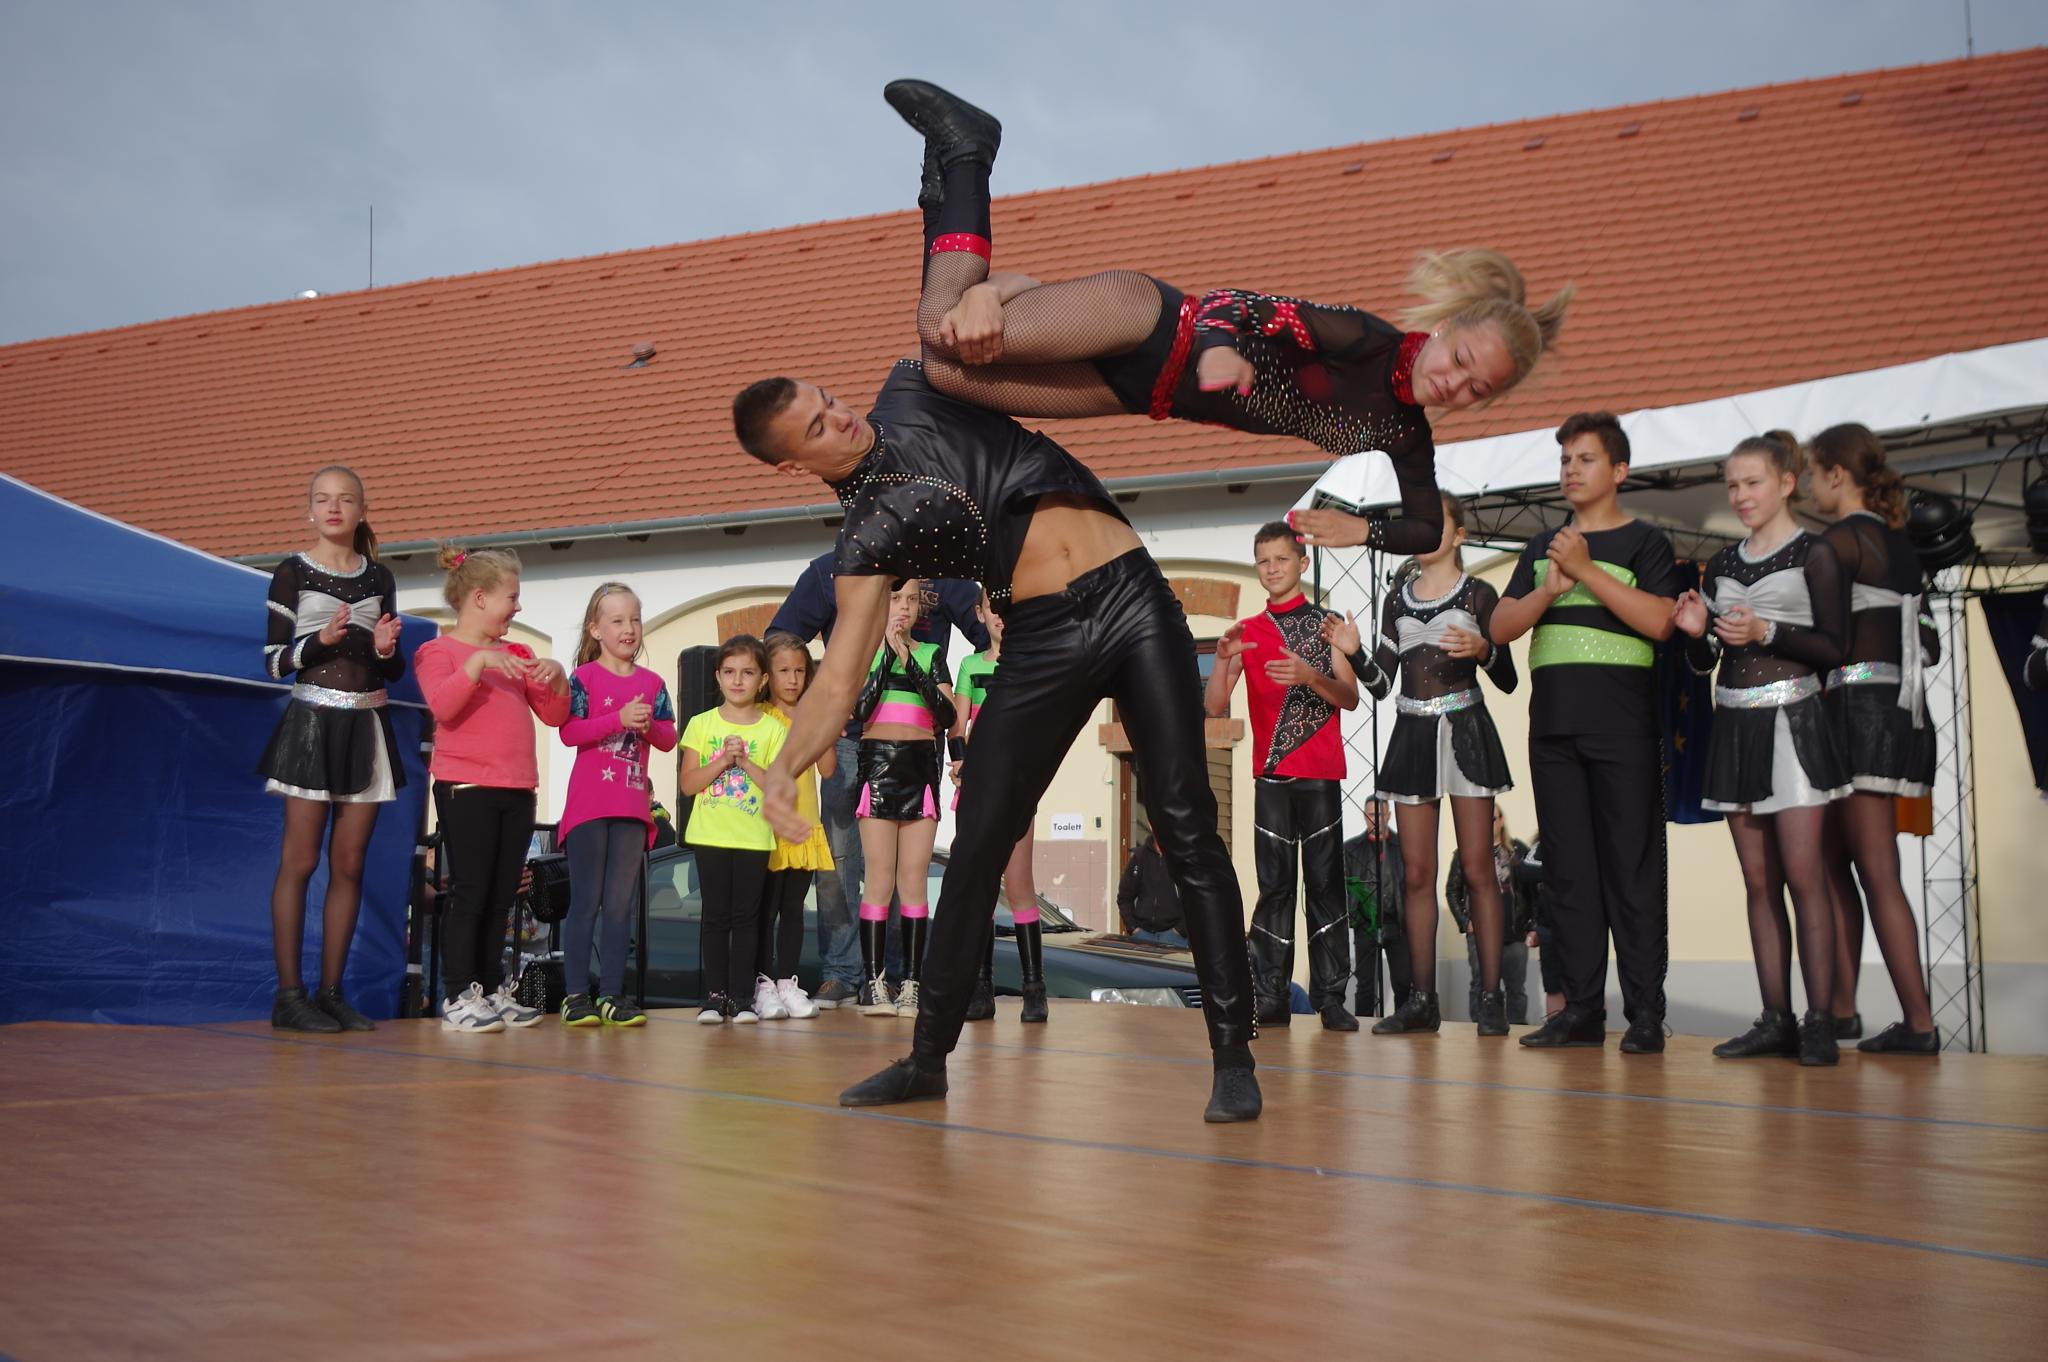 Dance dance by Pipli